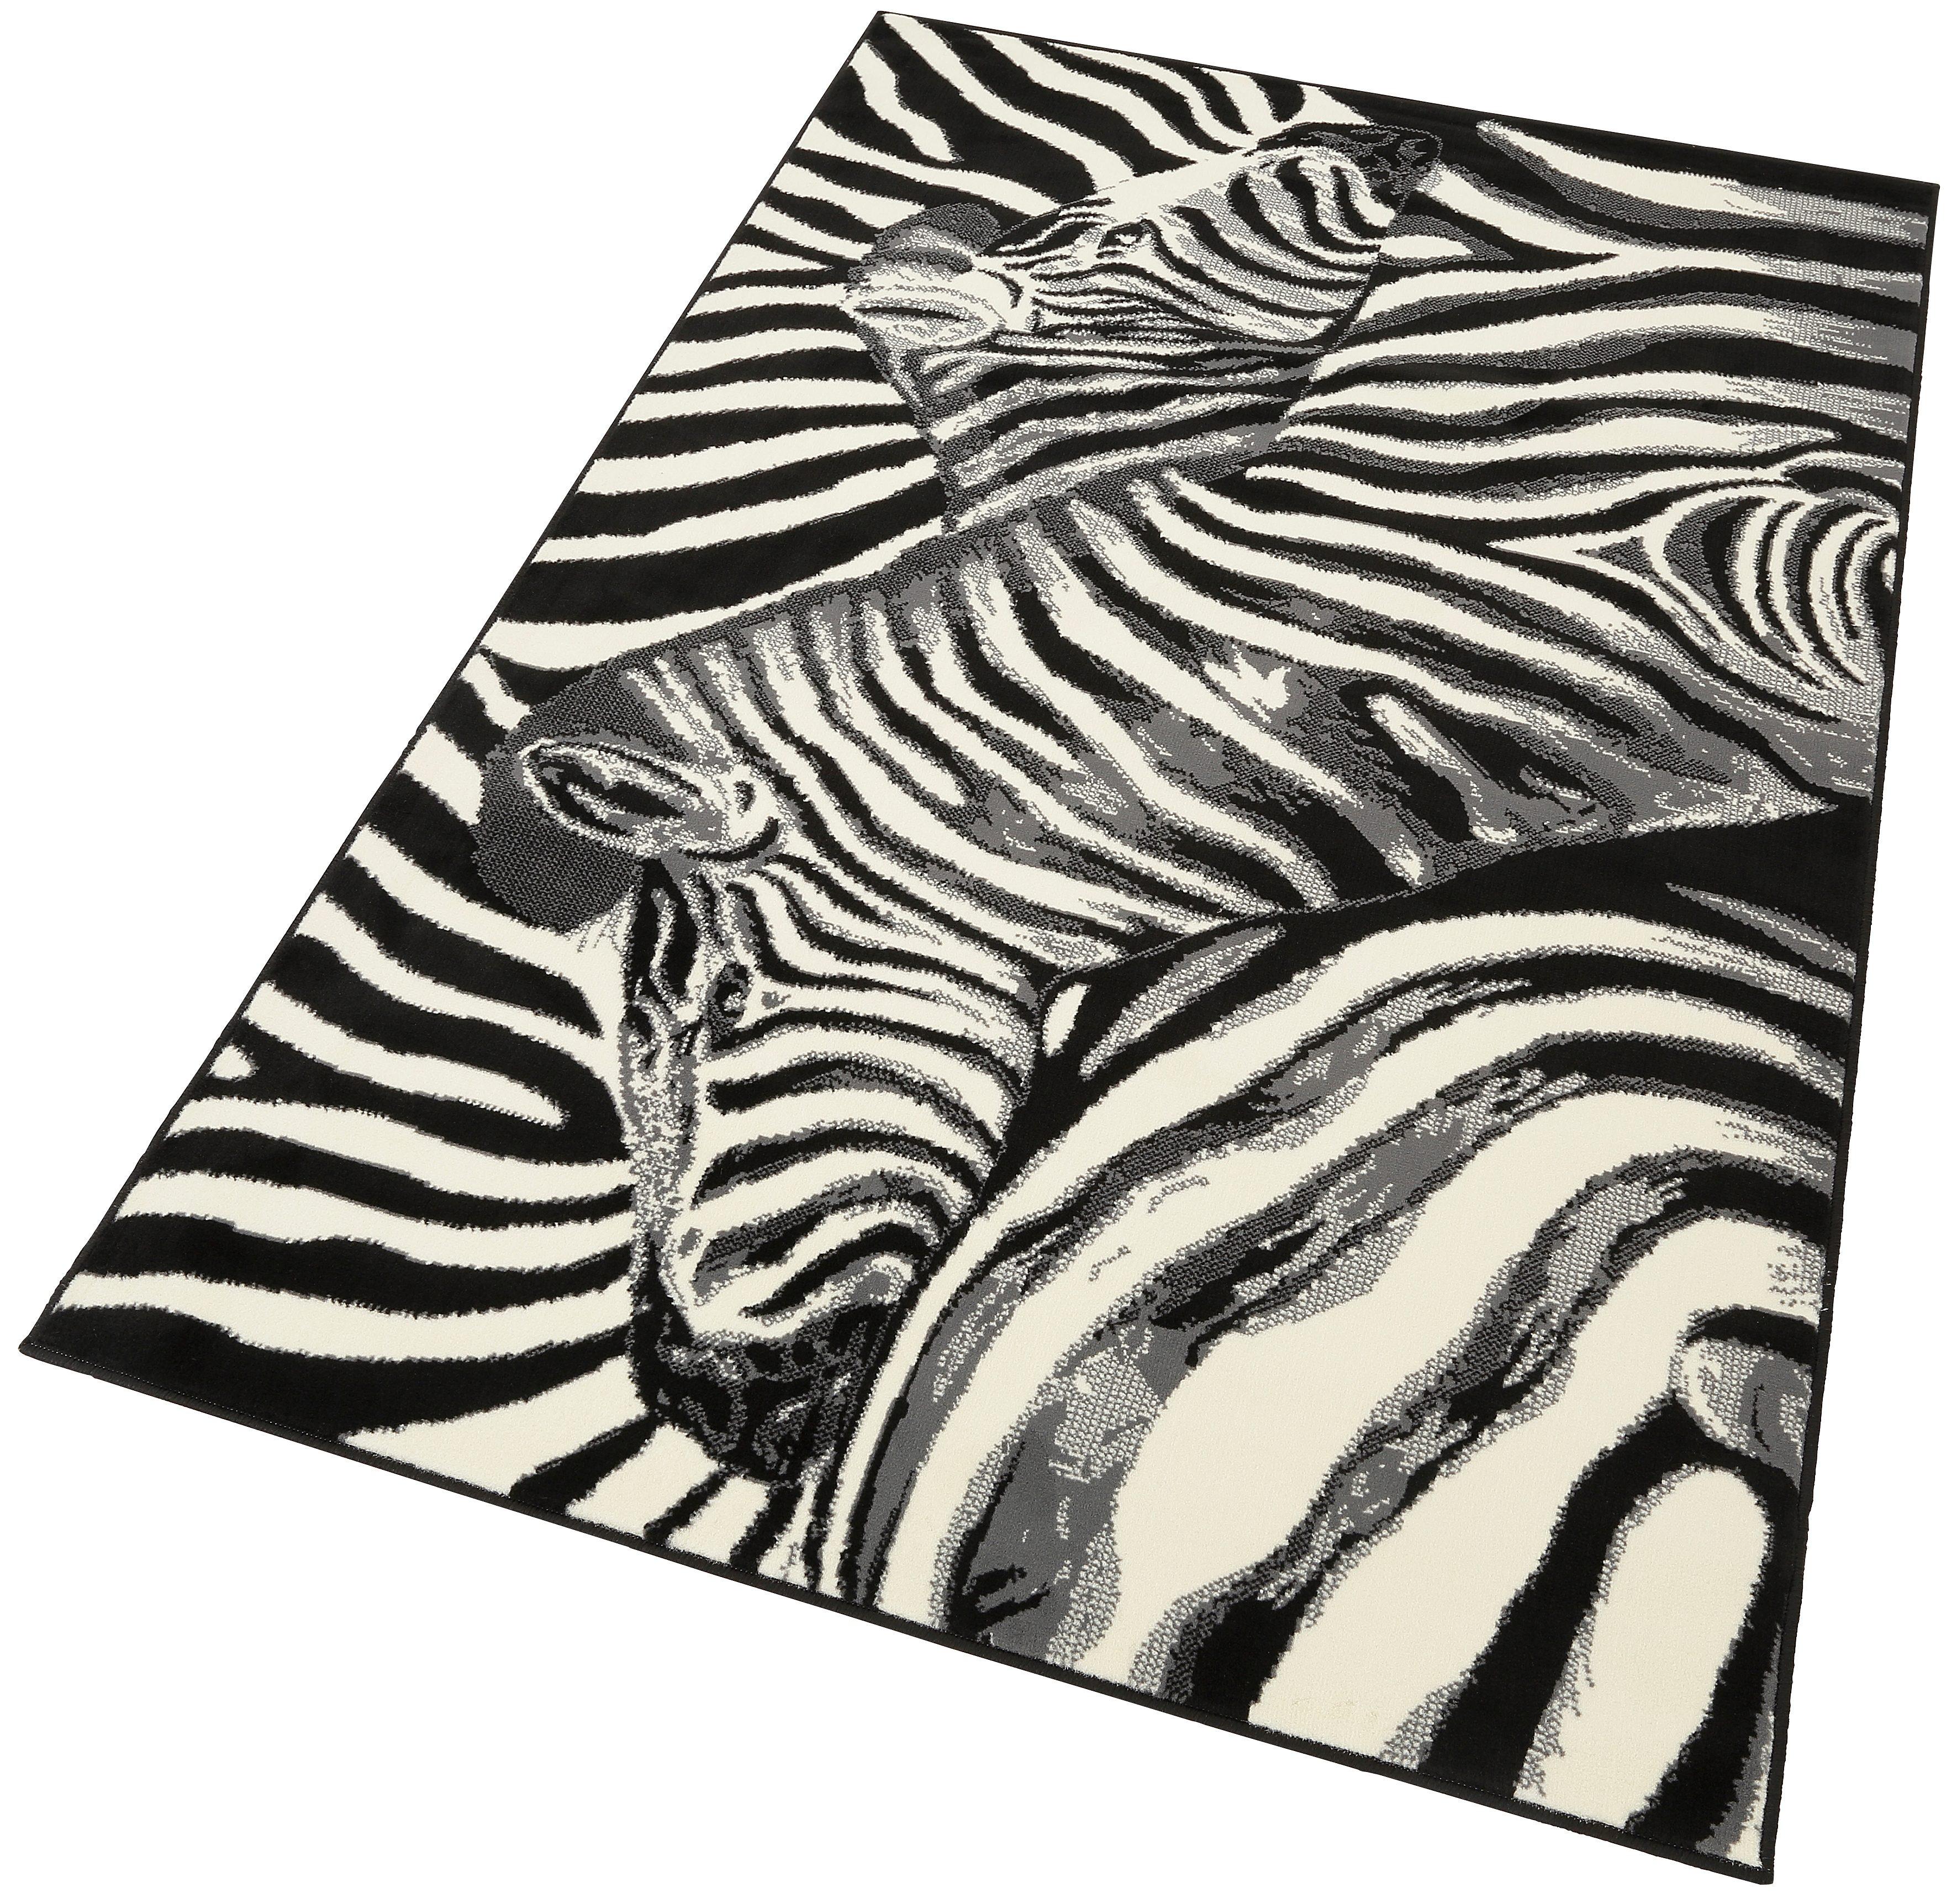 Designteppich »Zebra«, Hanse Home, rechteckig, Höhe 9 mm